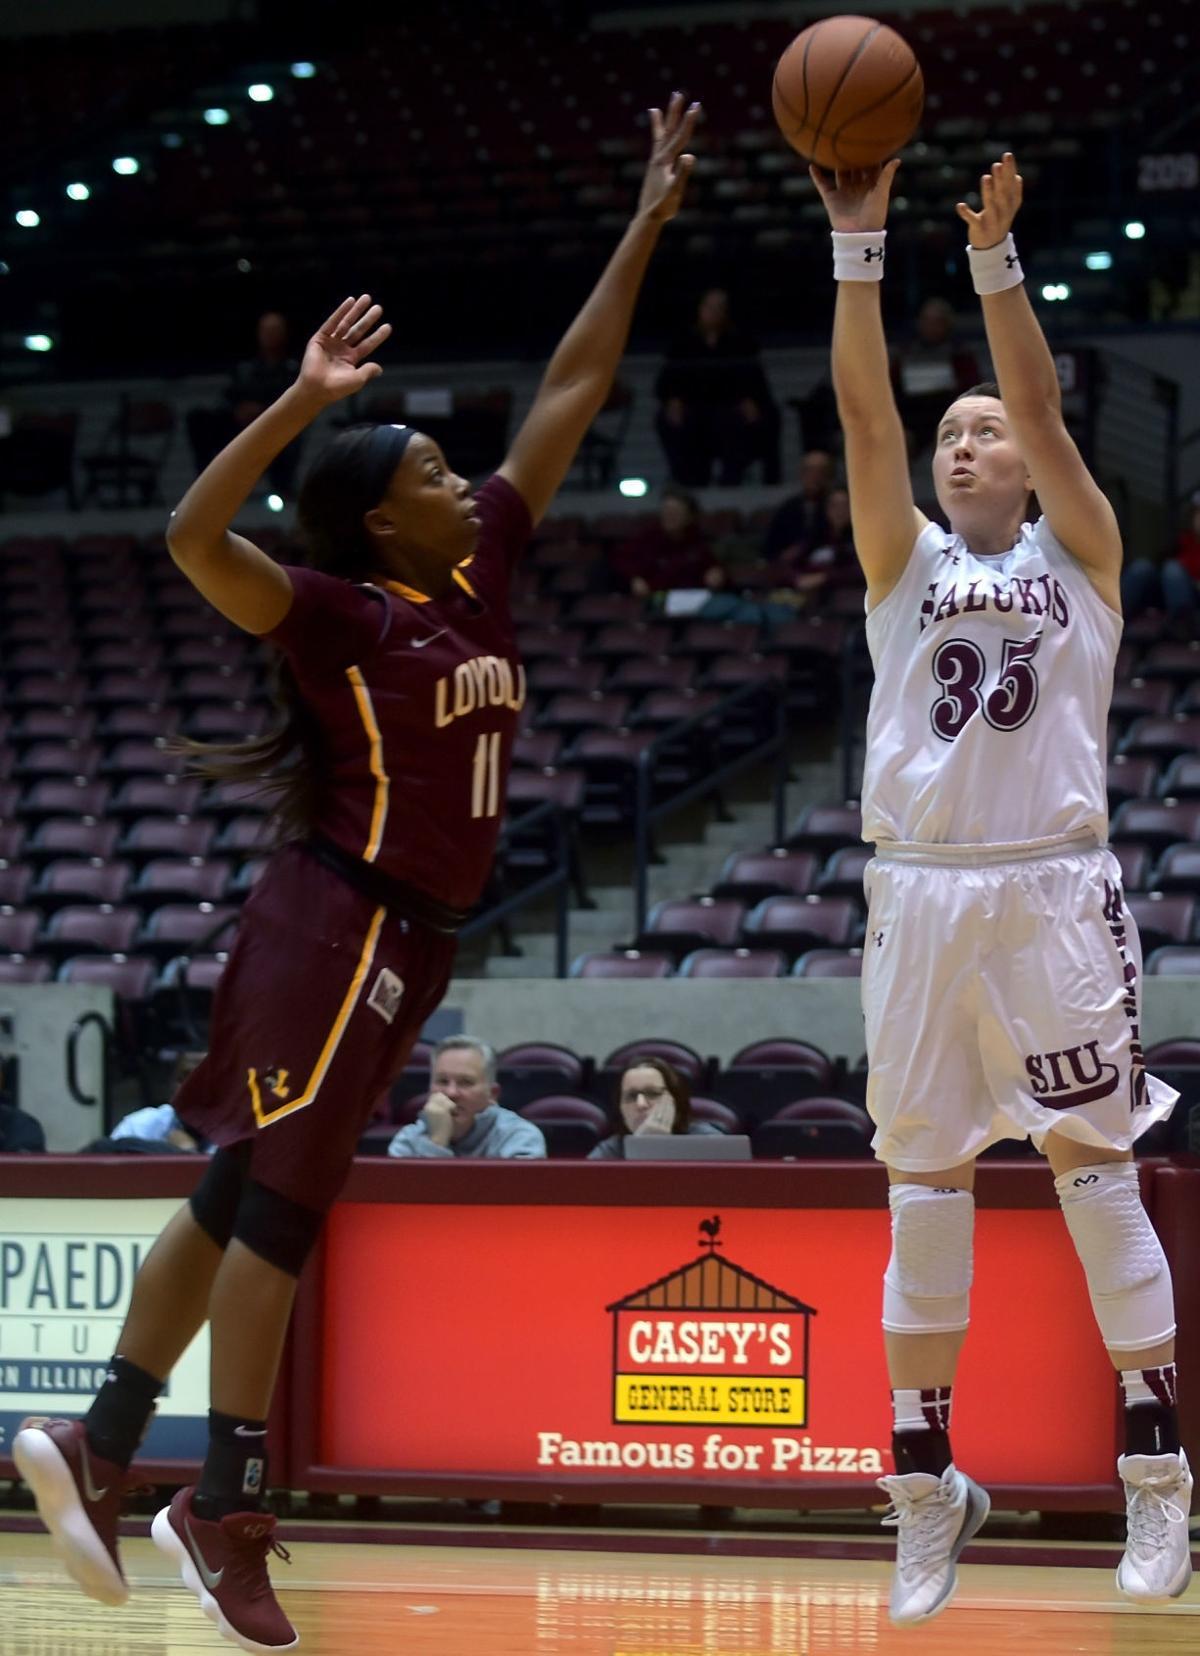 Saluki Women's Basketball | SIU downs Loyola, Stein gets win No. 350